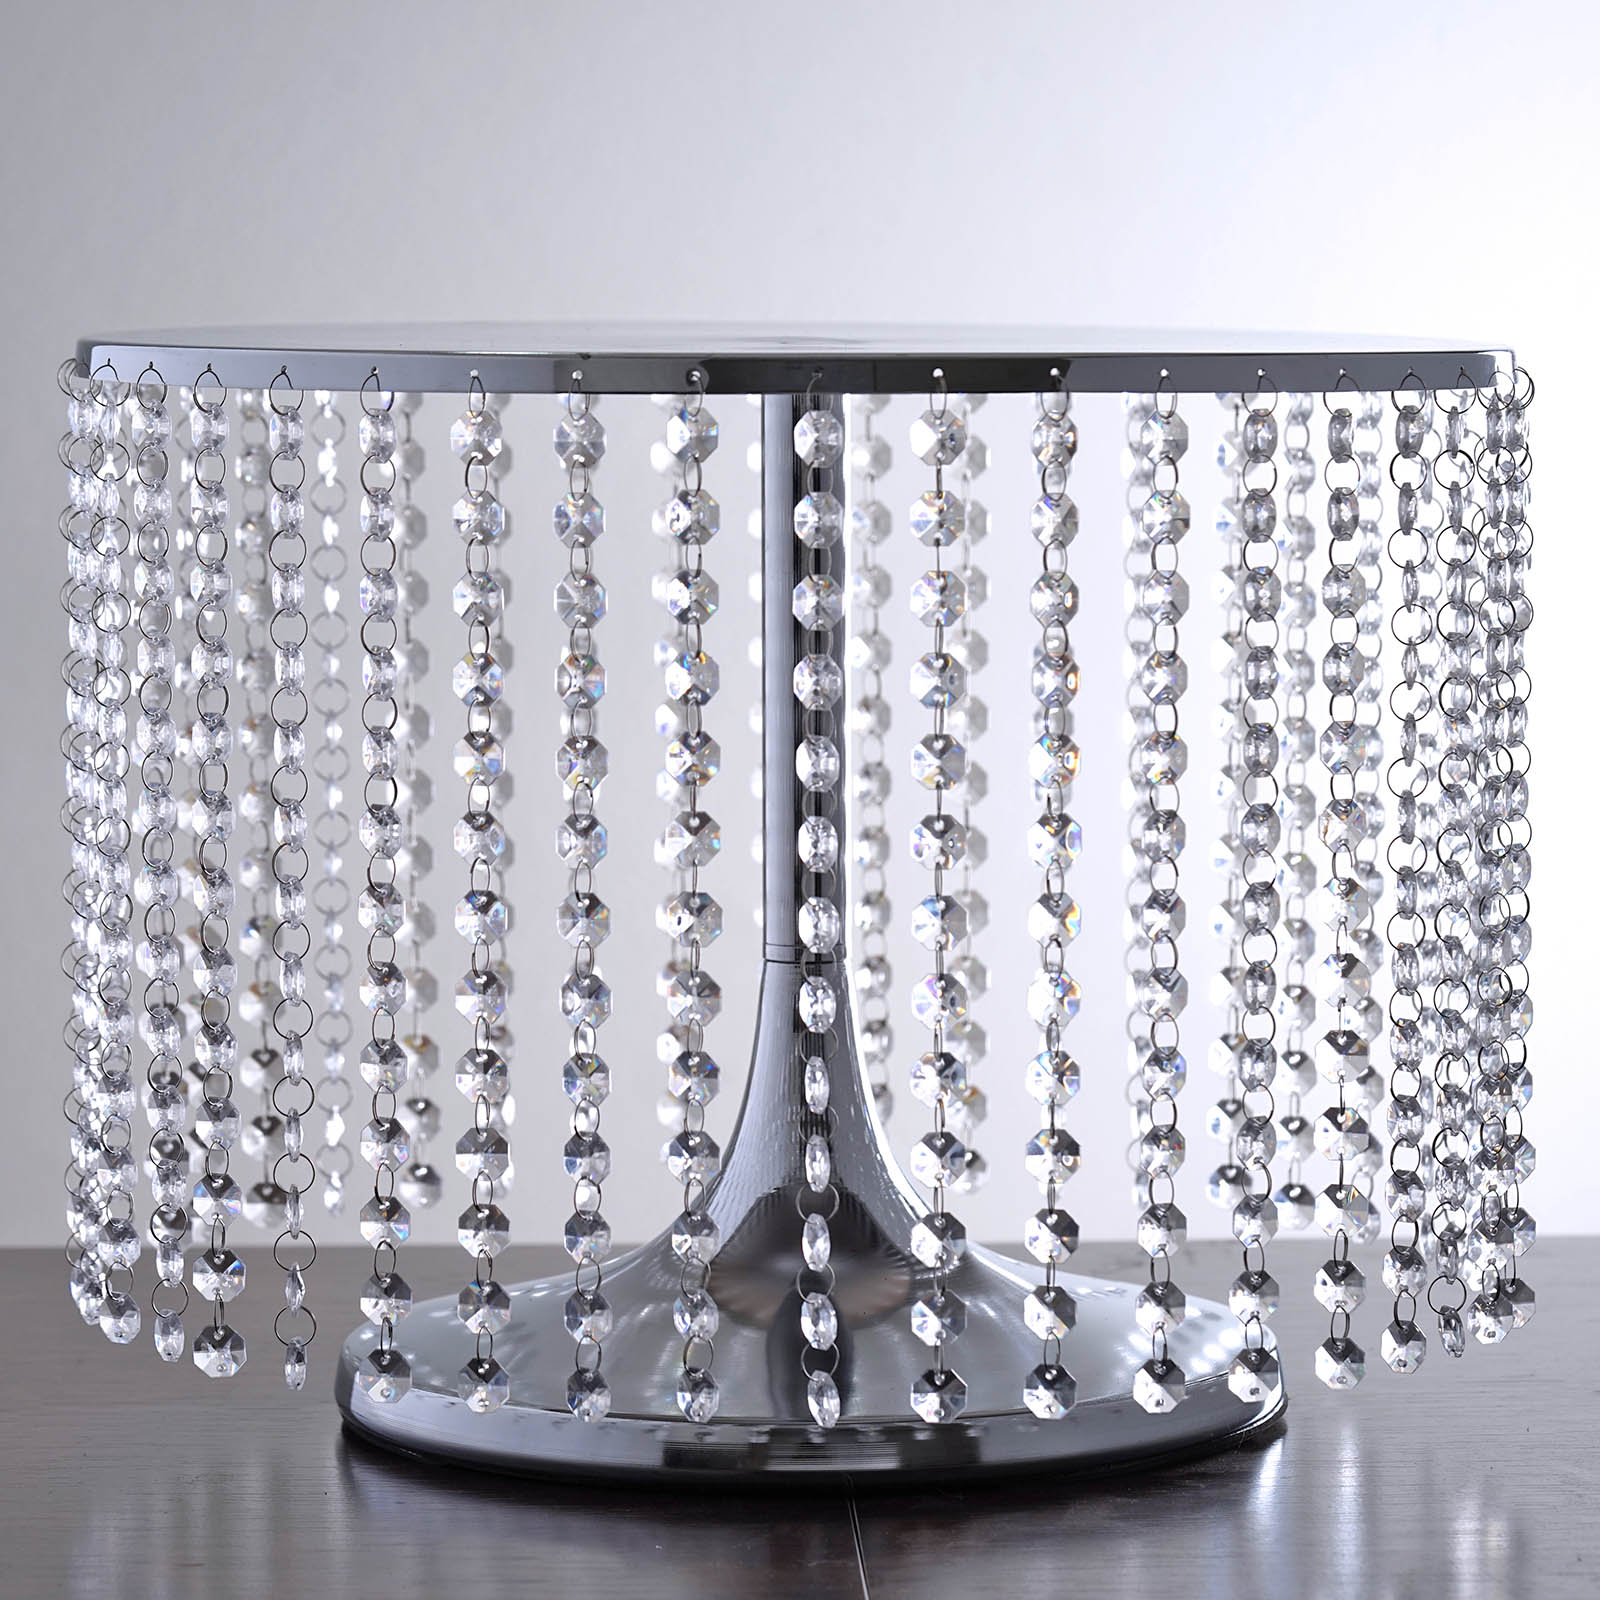 Efavormart Silver Breathtaking Crystal Pendants Metal Chandelier Wedding Birthday Party Dessert Cake Pedestal Display... by